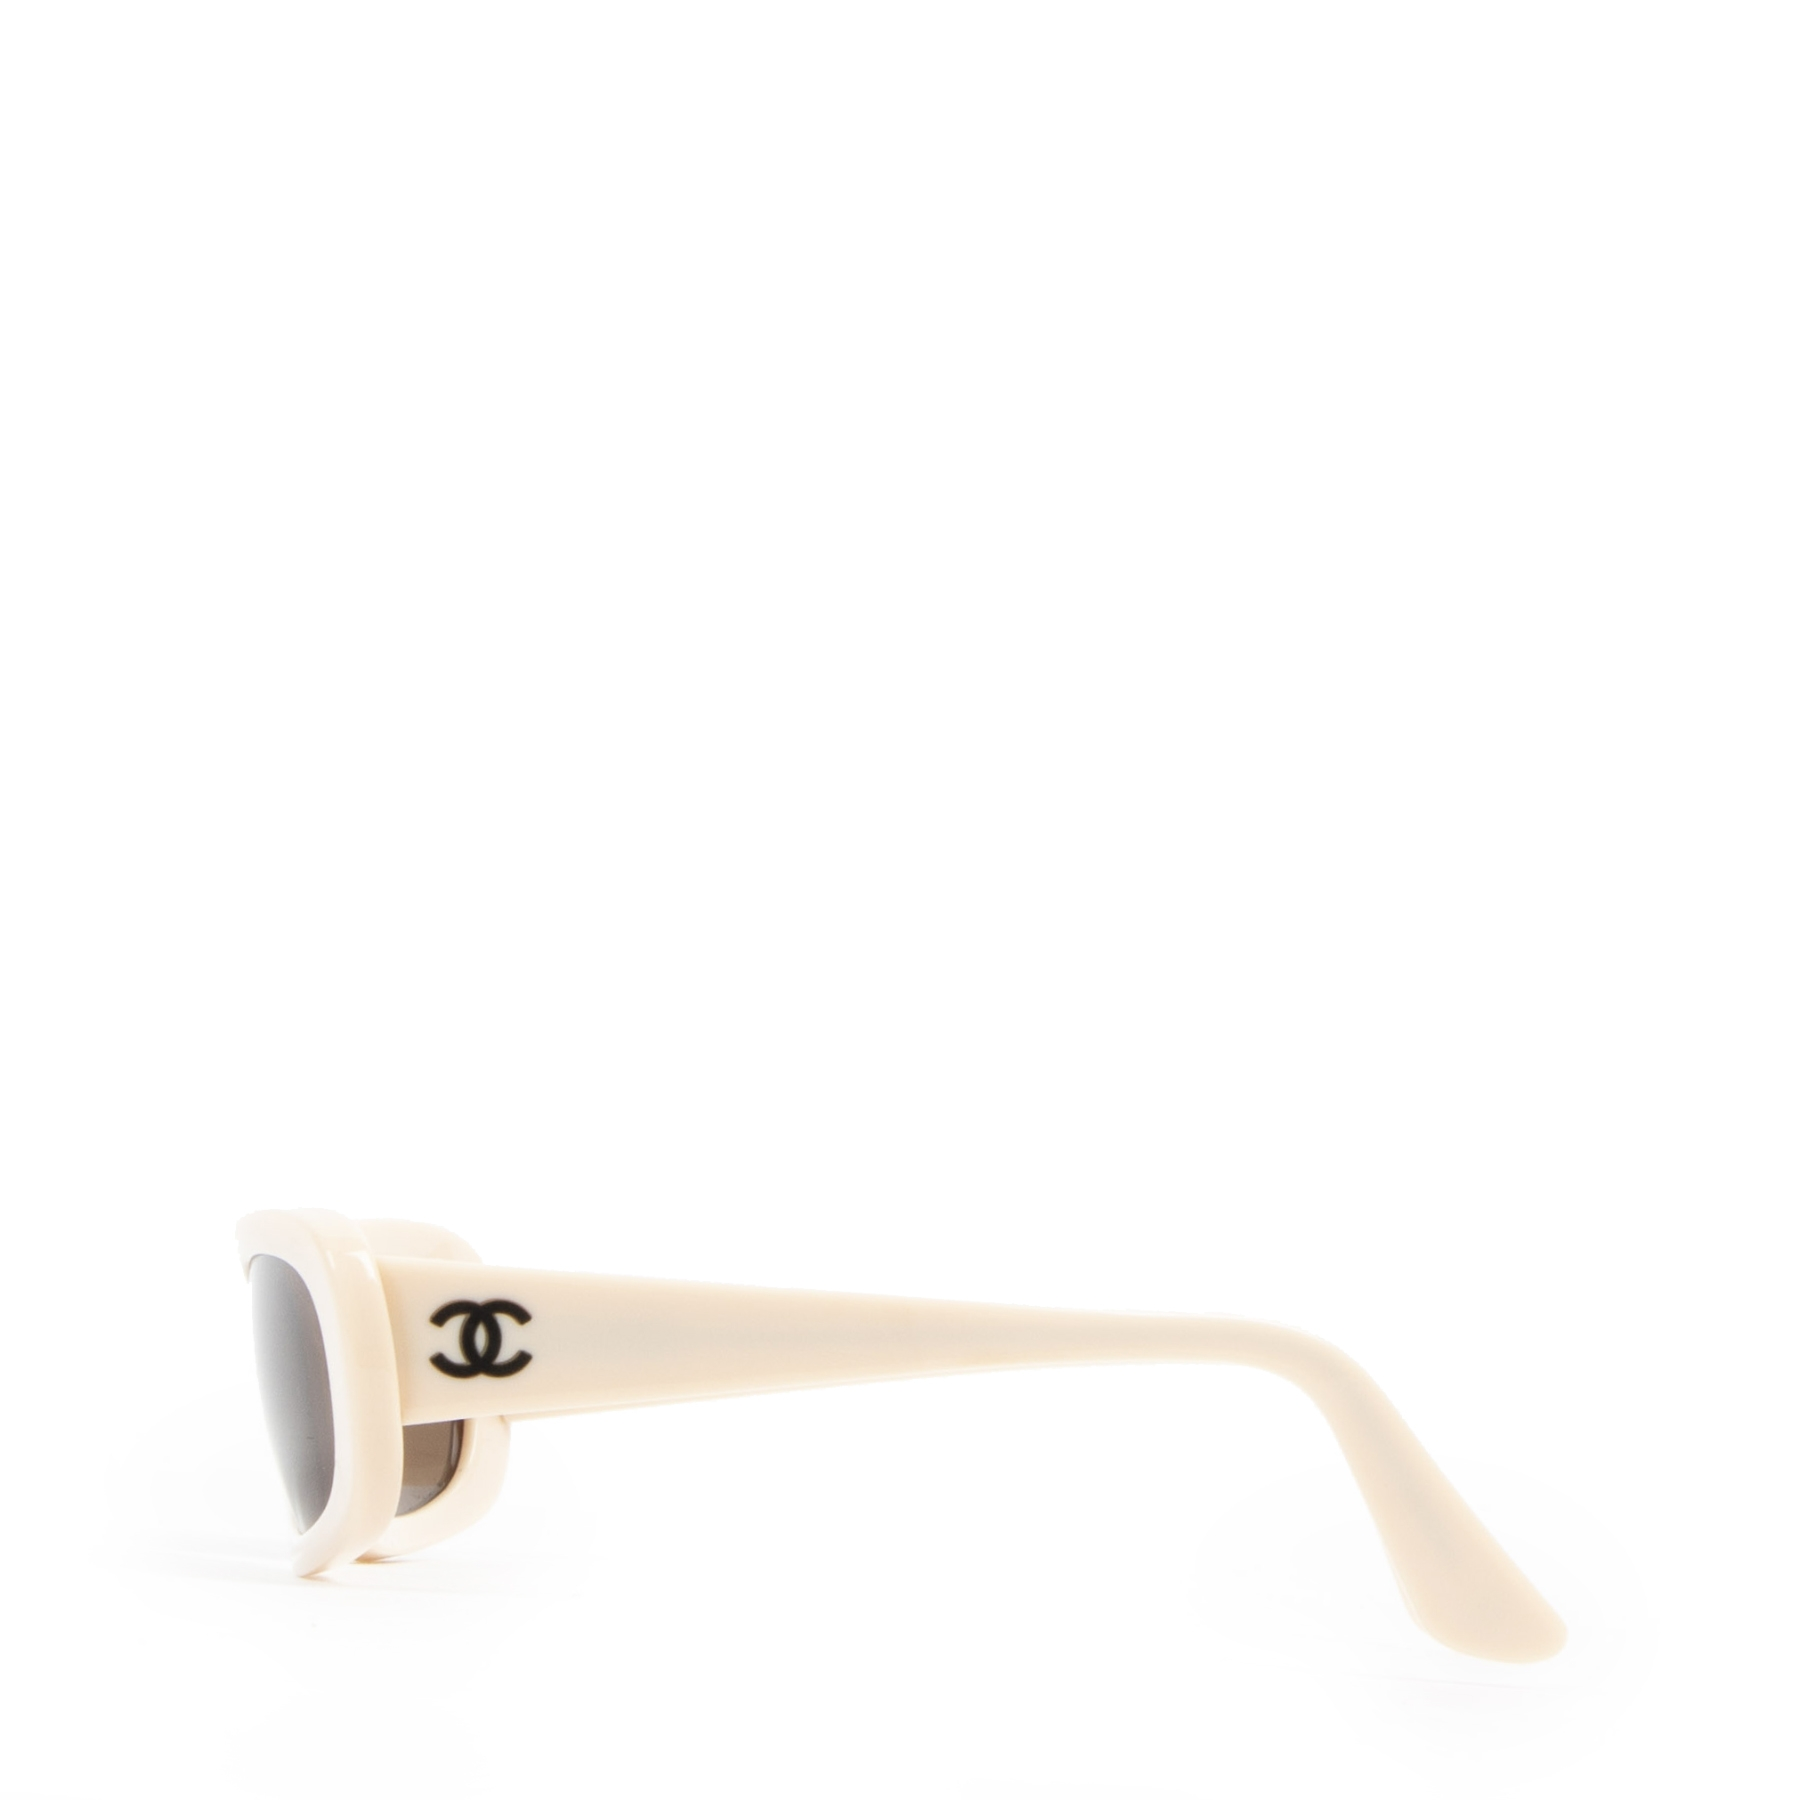 Authentieke tweedehands vintage Chanel Beige CC Logo Sunglasses koop online webshop LabelLOV